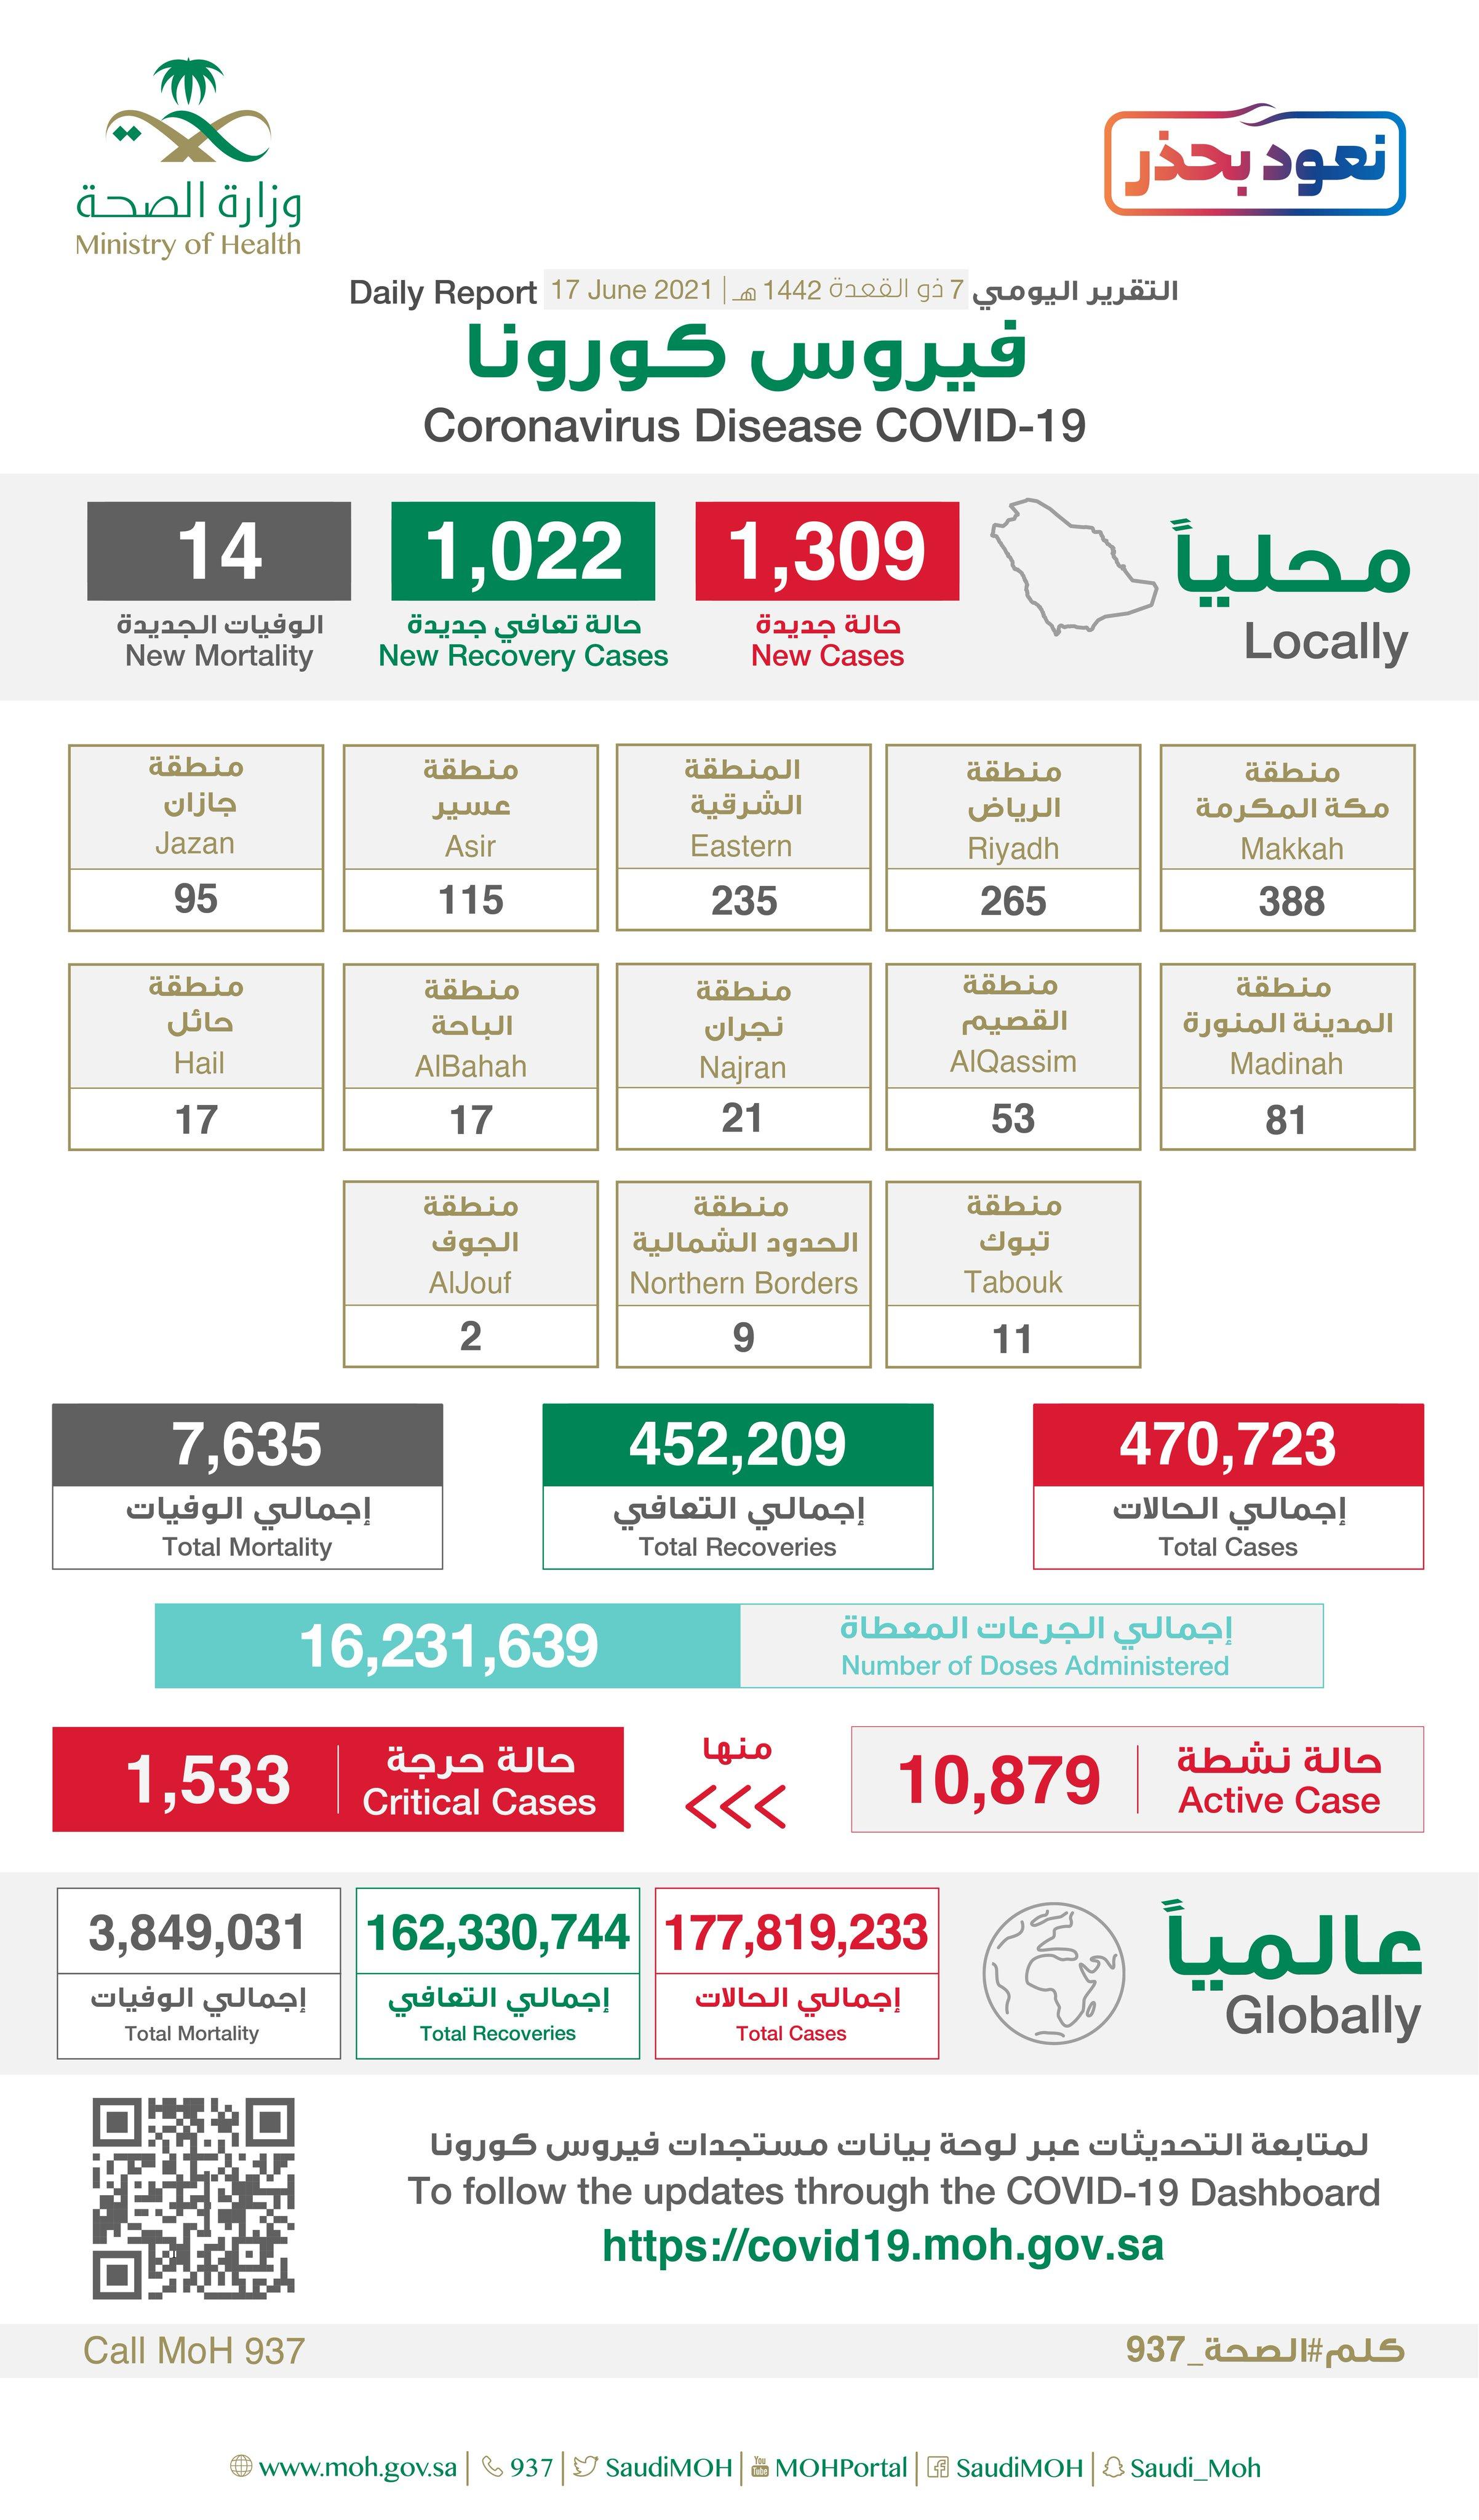 Saudi Arabia Coronavirus : Total Cases :470,723 , New Cases : 1,309 , Cured : 452,209 , Deaths: 7,635, Active Cases : 10,879